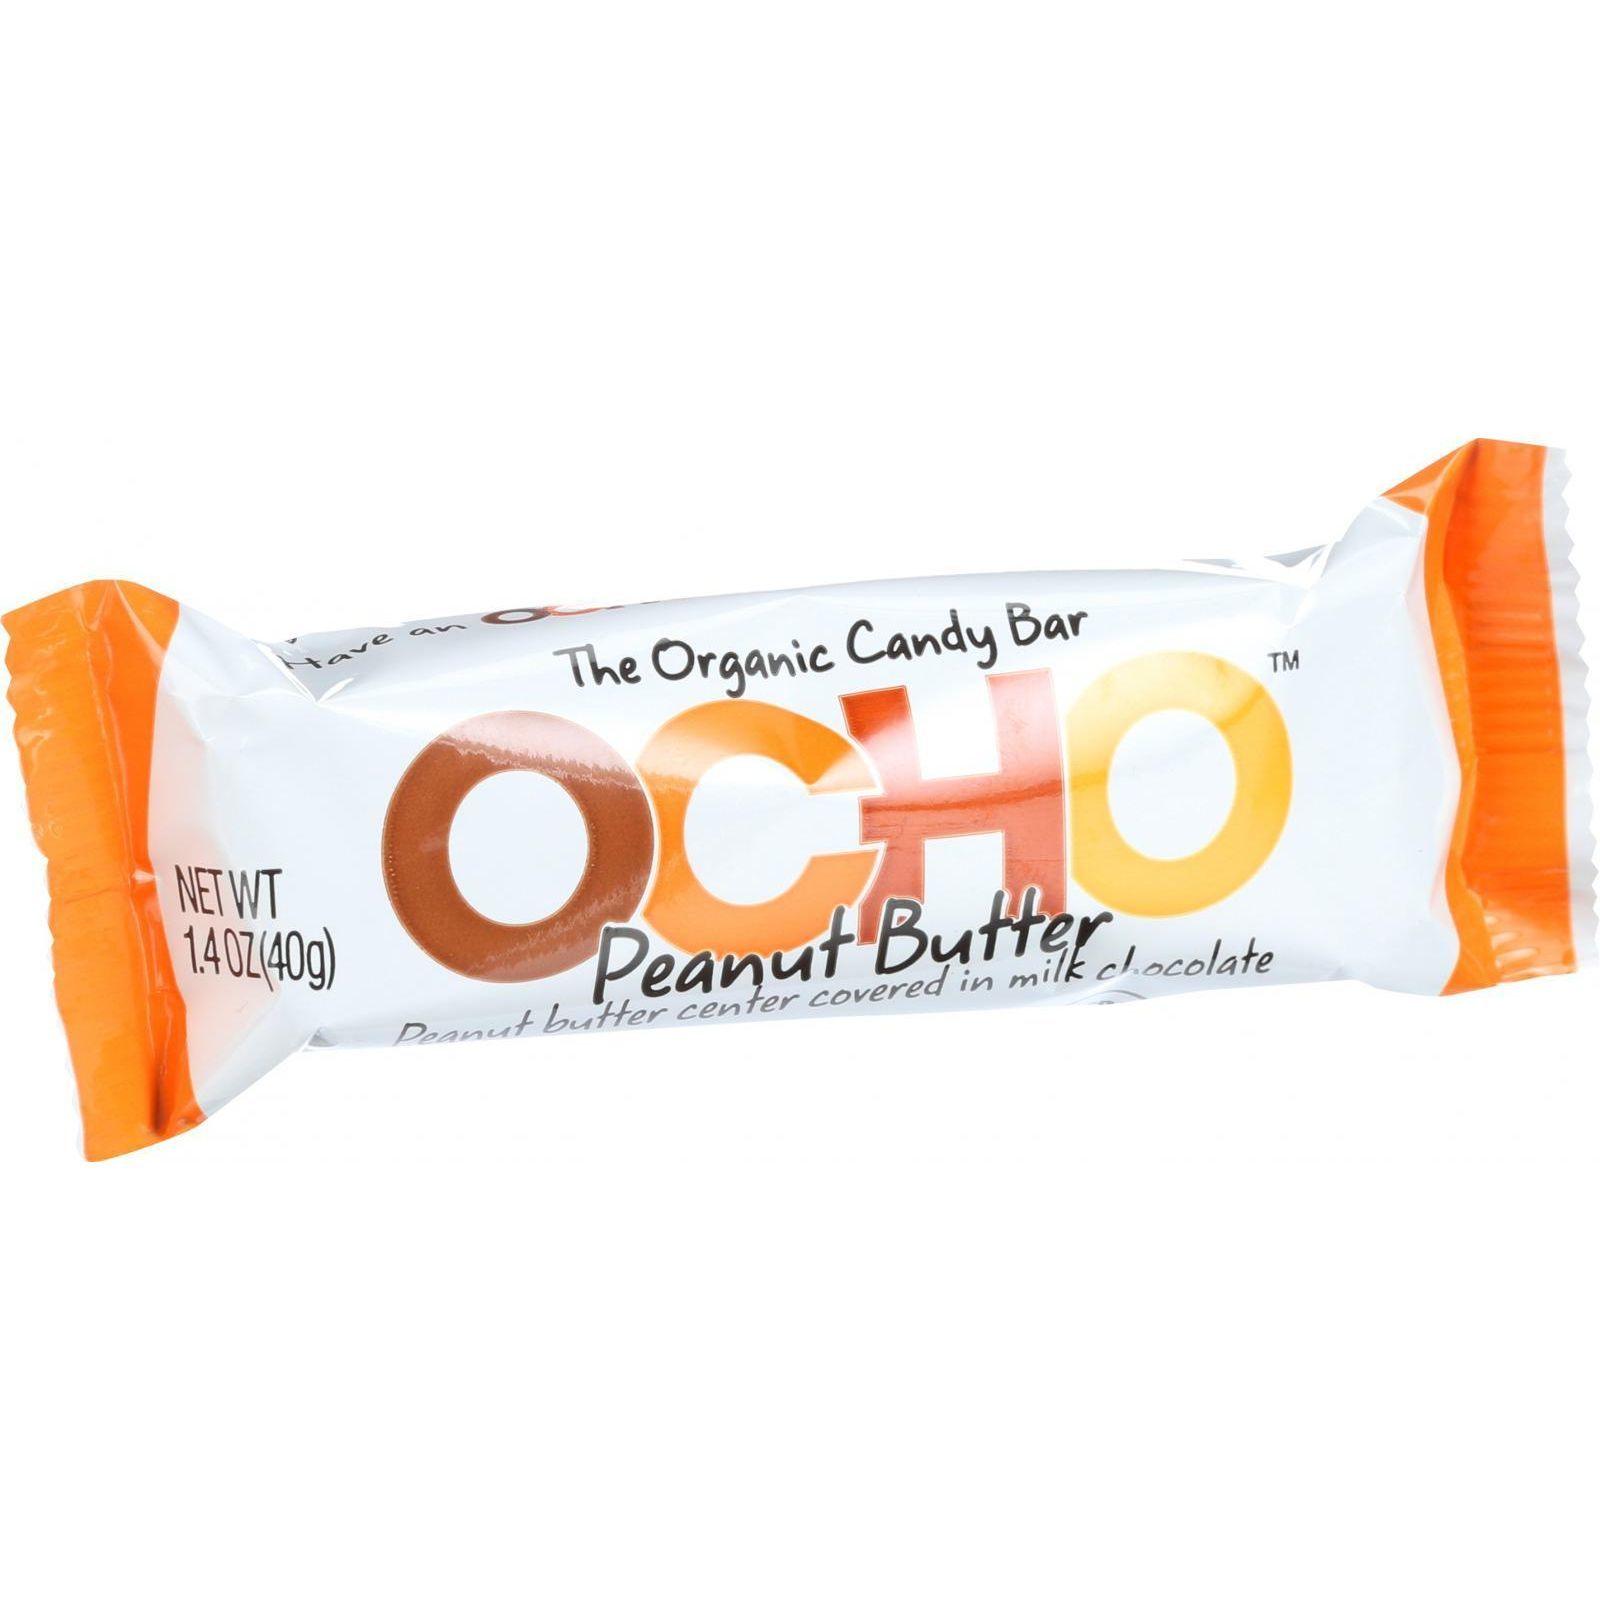 Ocho Candy Organic Candy Bar - Peanut Butter - 1.4 oz - Case of 18